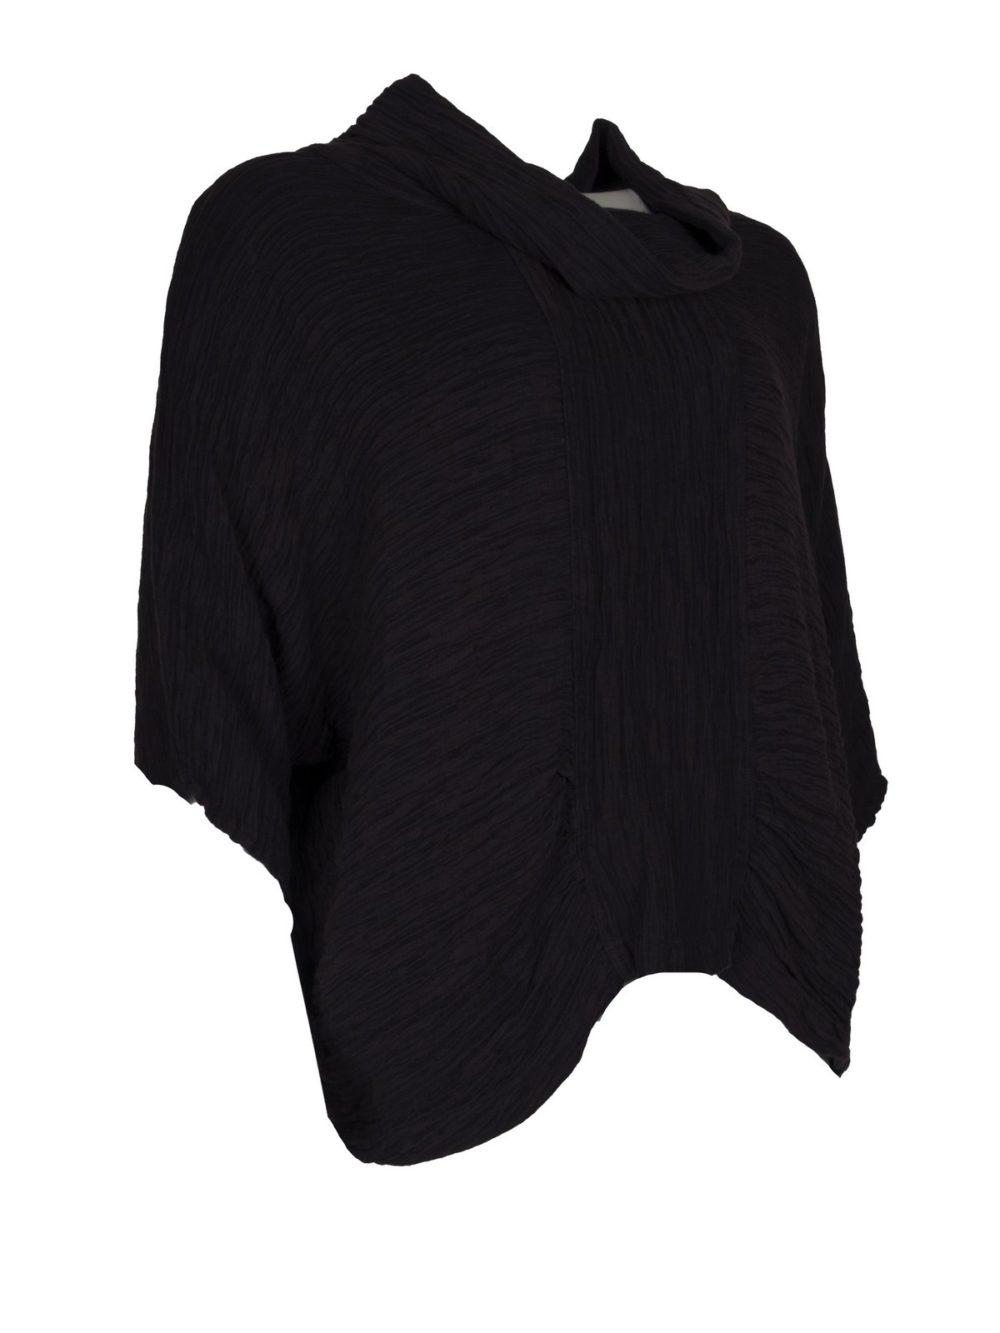 Blouse 5403-V218-2 Grizas Katie Kerr Women's Clothing